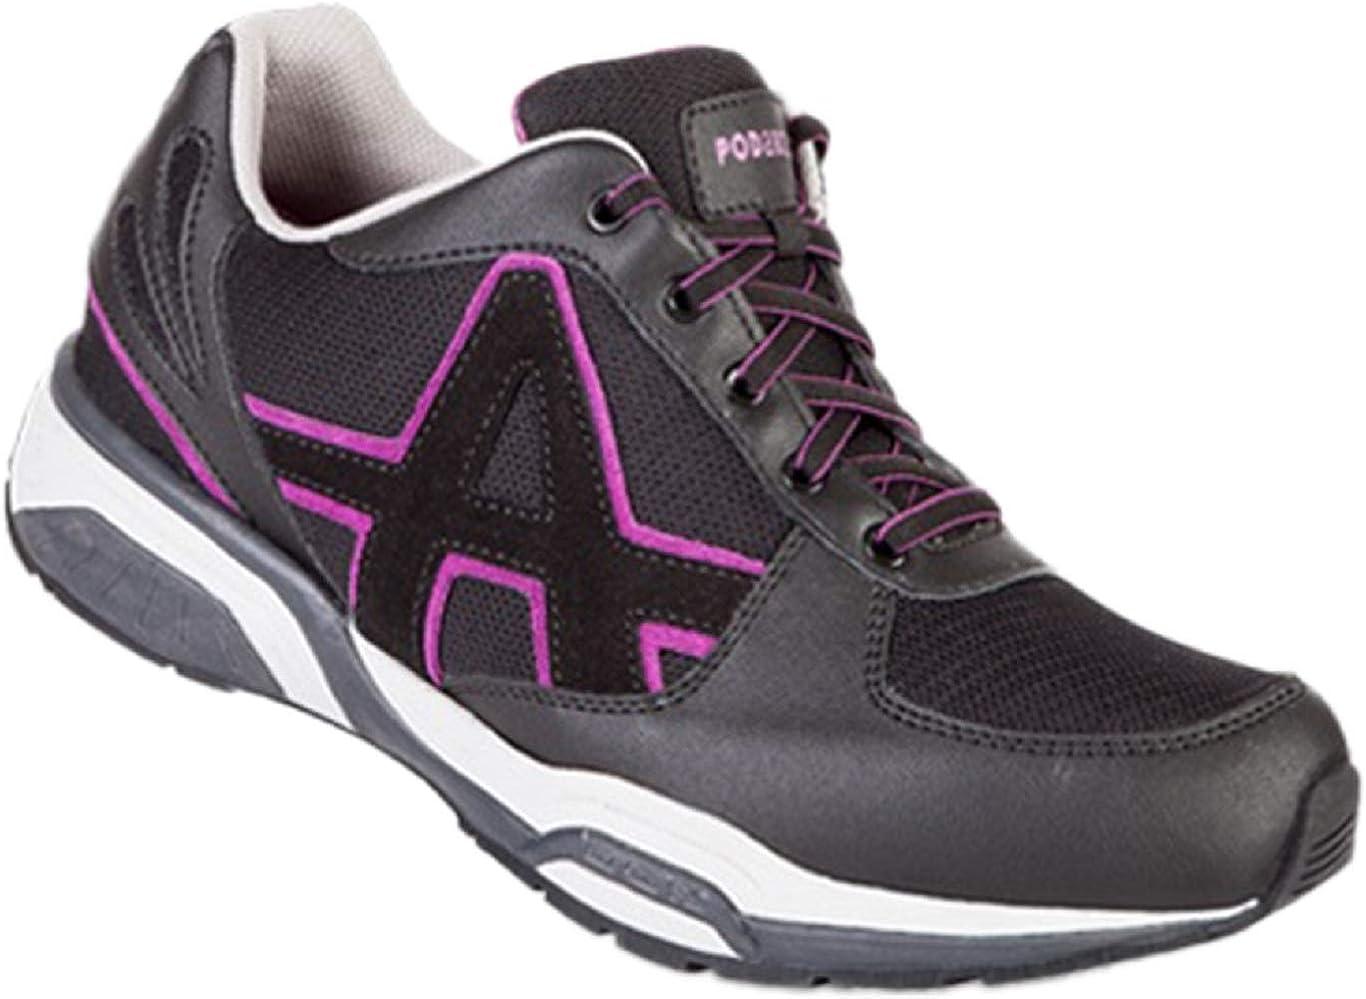 Podartis - Zapatillas Activity 2.0 Italia PA 4171 para Mujer Size ...